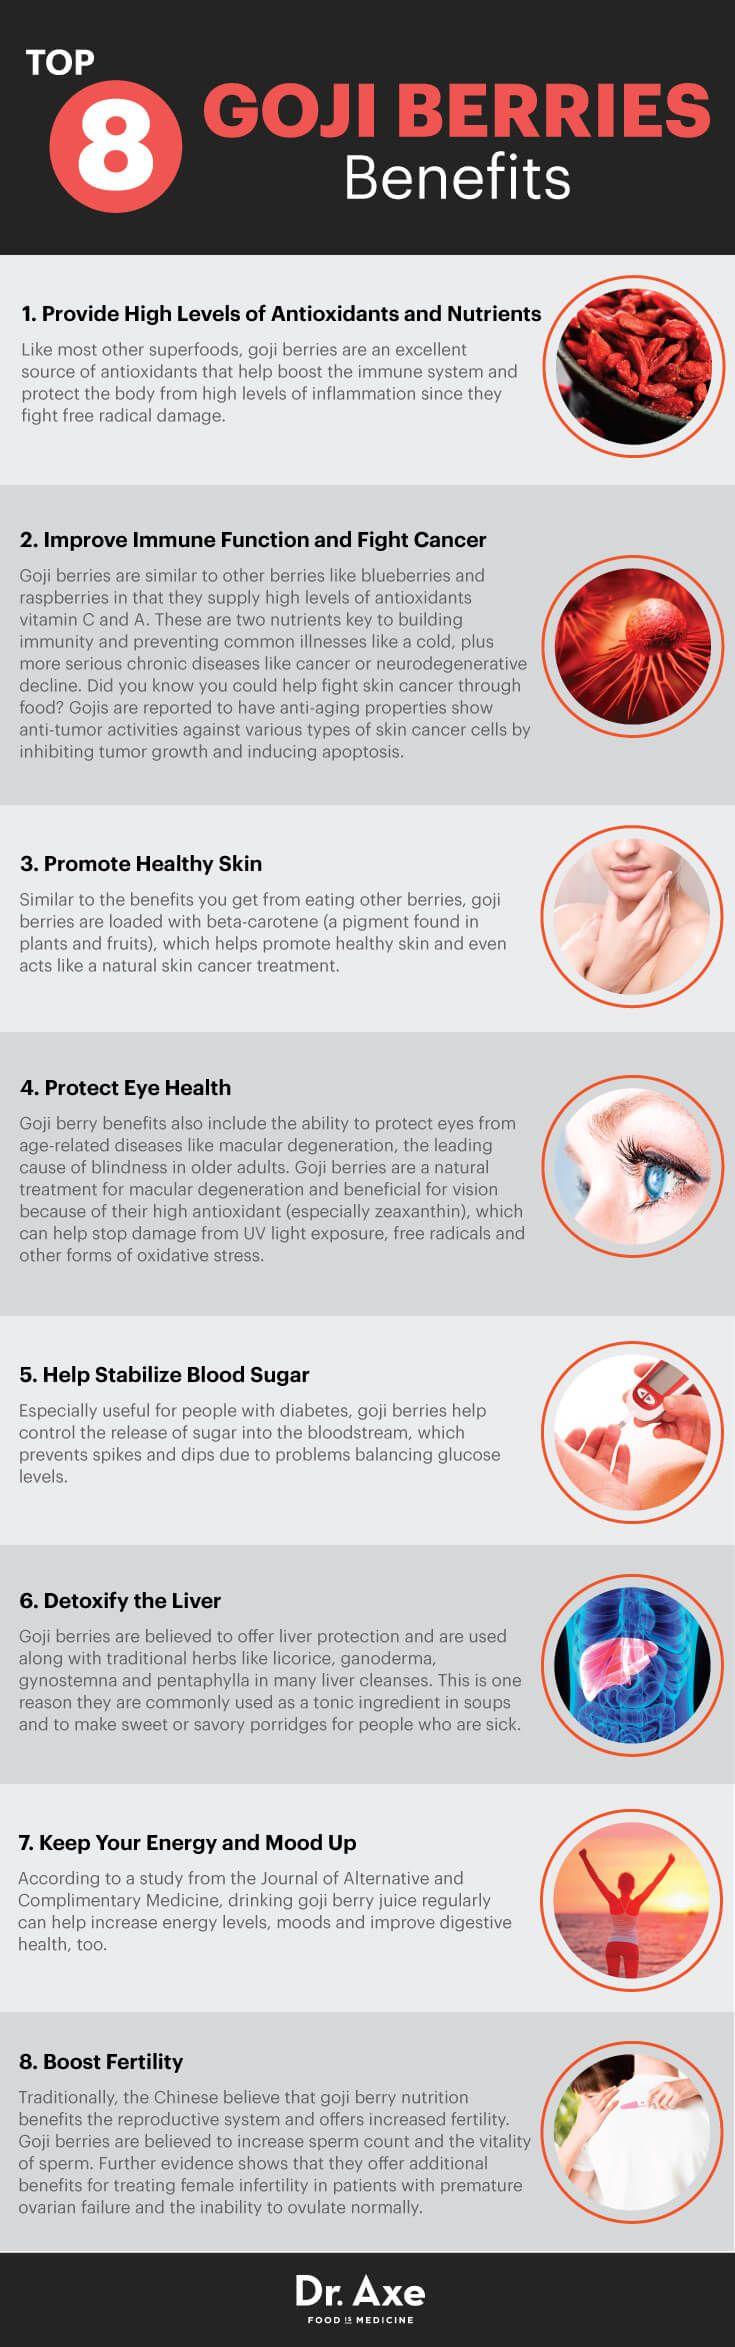 Goji Berries: Antioxidant & Anti-inflammatory Superfruit - Dr. Axe